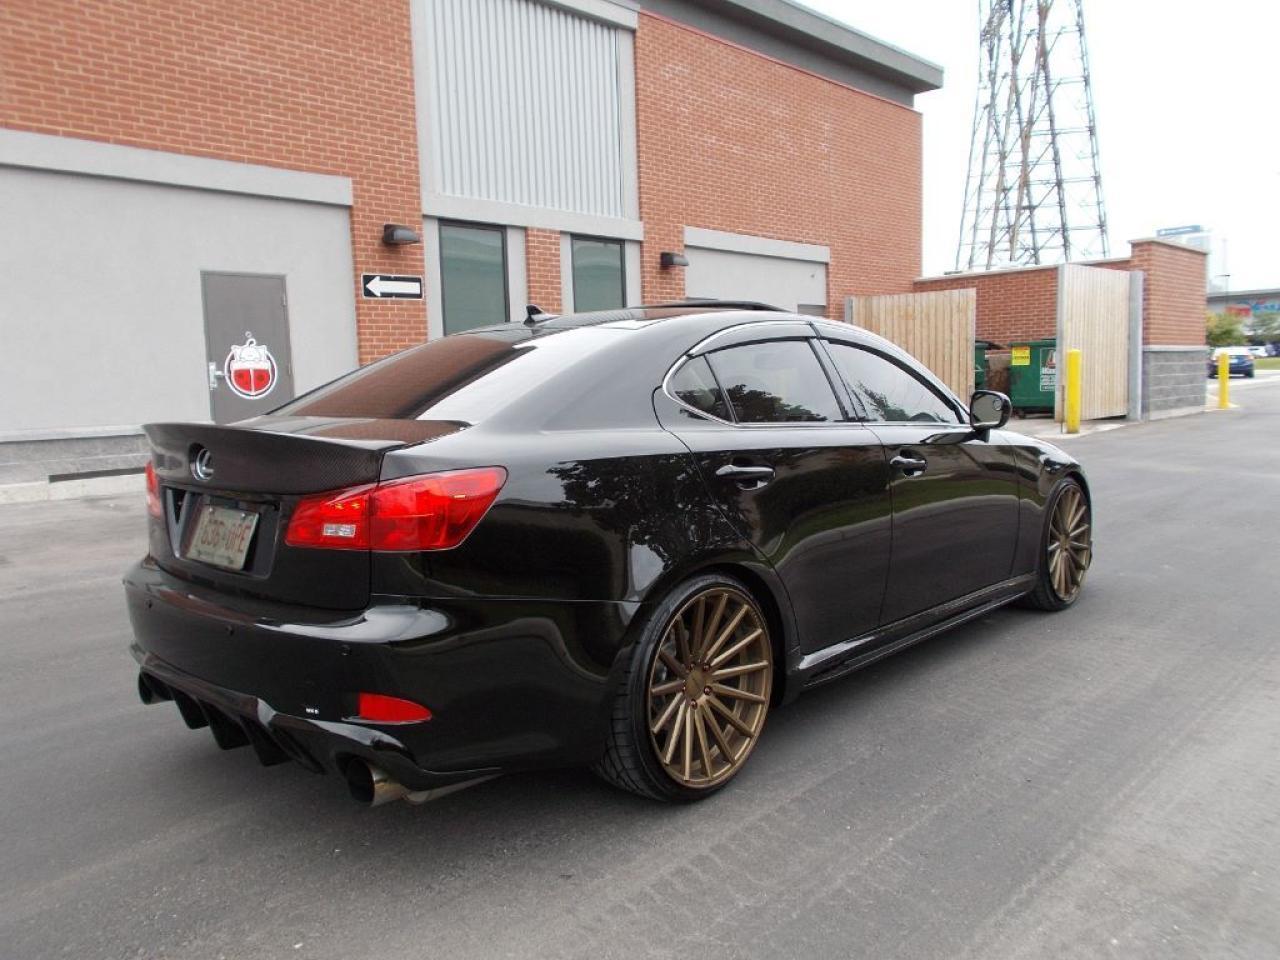 Used 2008 Lexus Is 350 Sold For Sale In Etobicoke